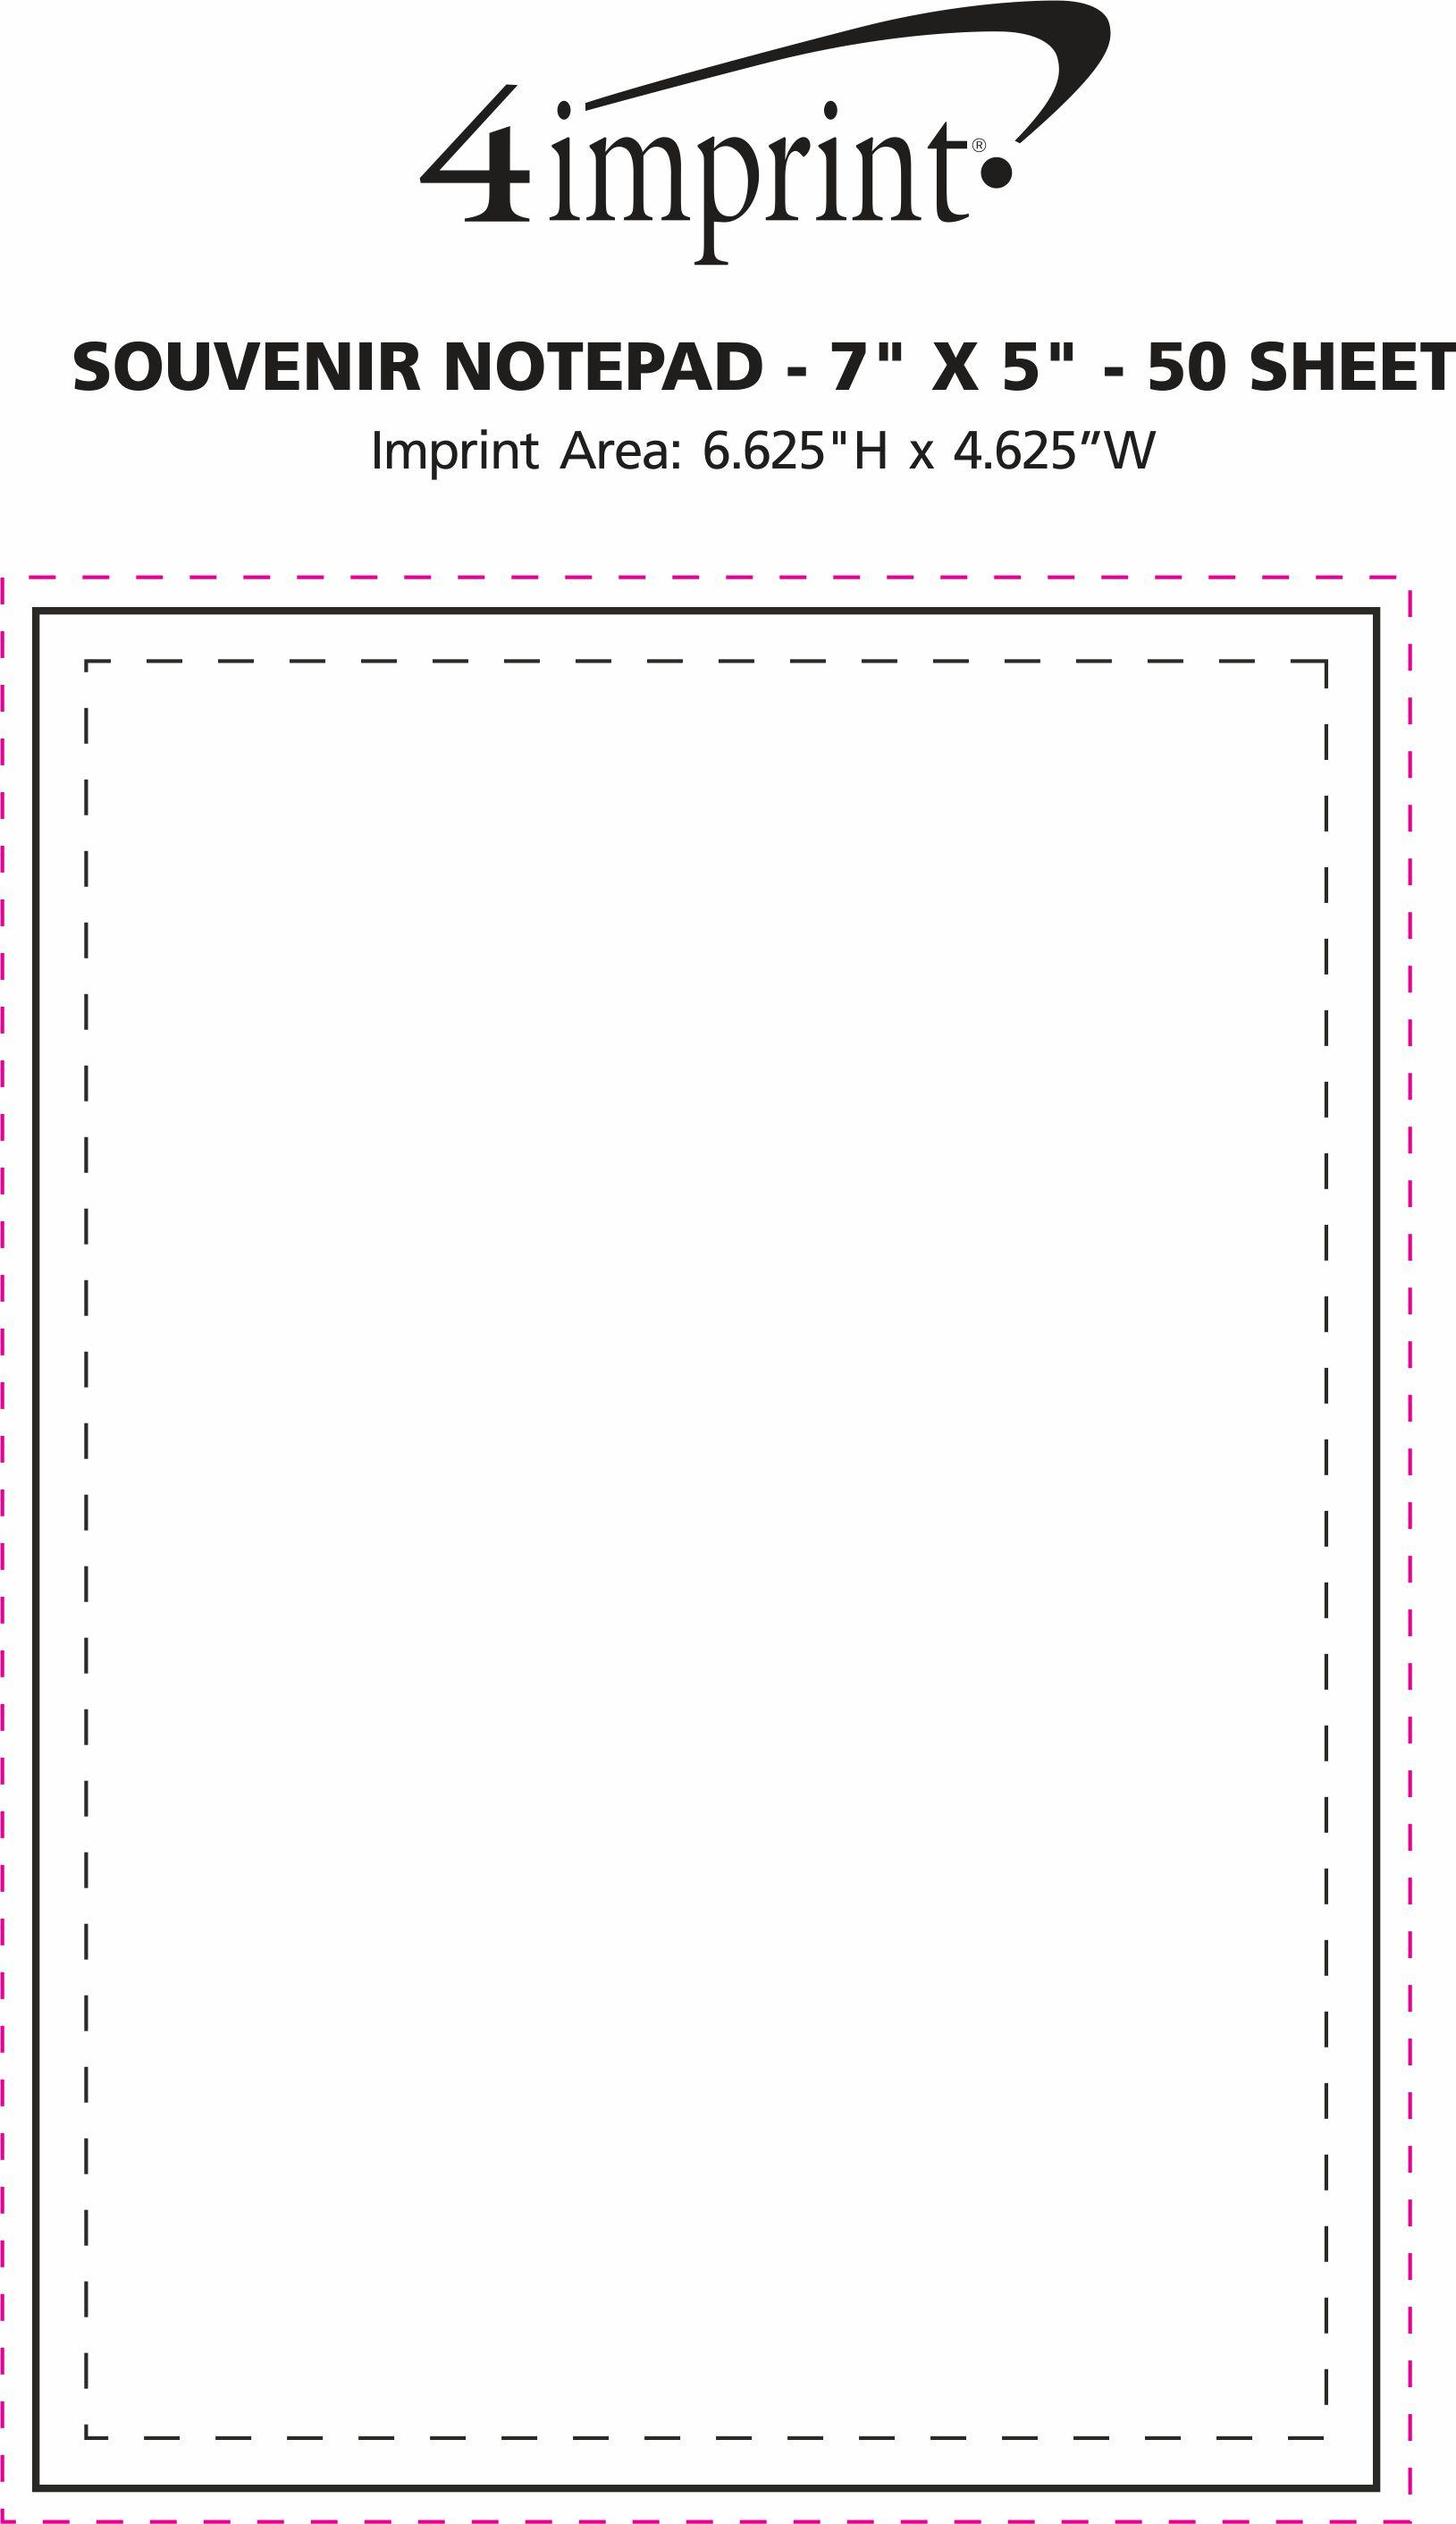 "Imprint Area of Bic Non-Adhesive Notepad - 7"" x 5"" - 50 Sheet"